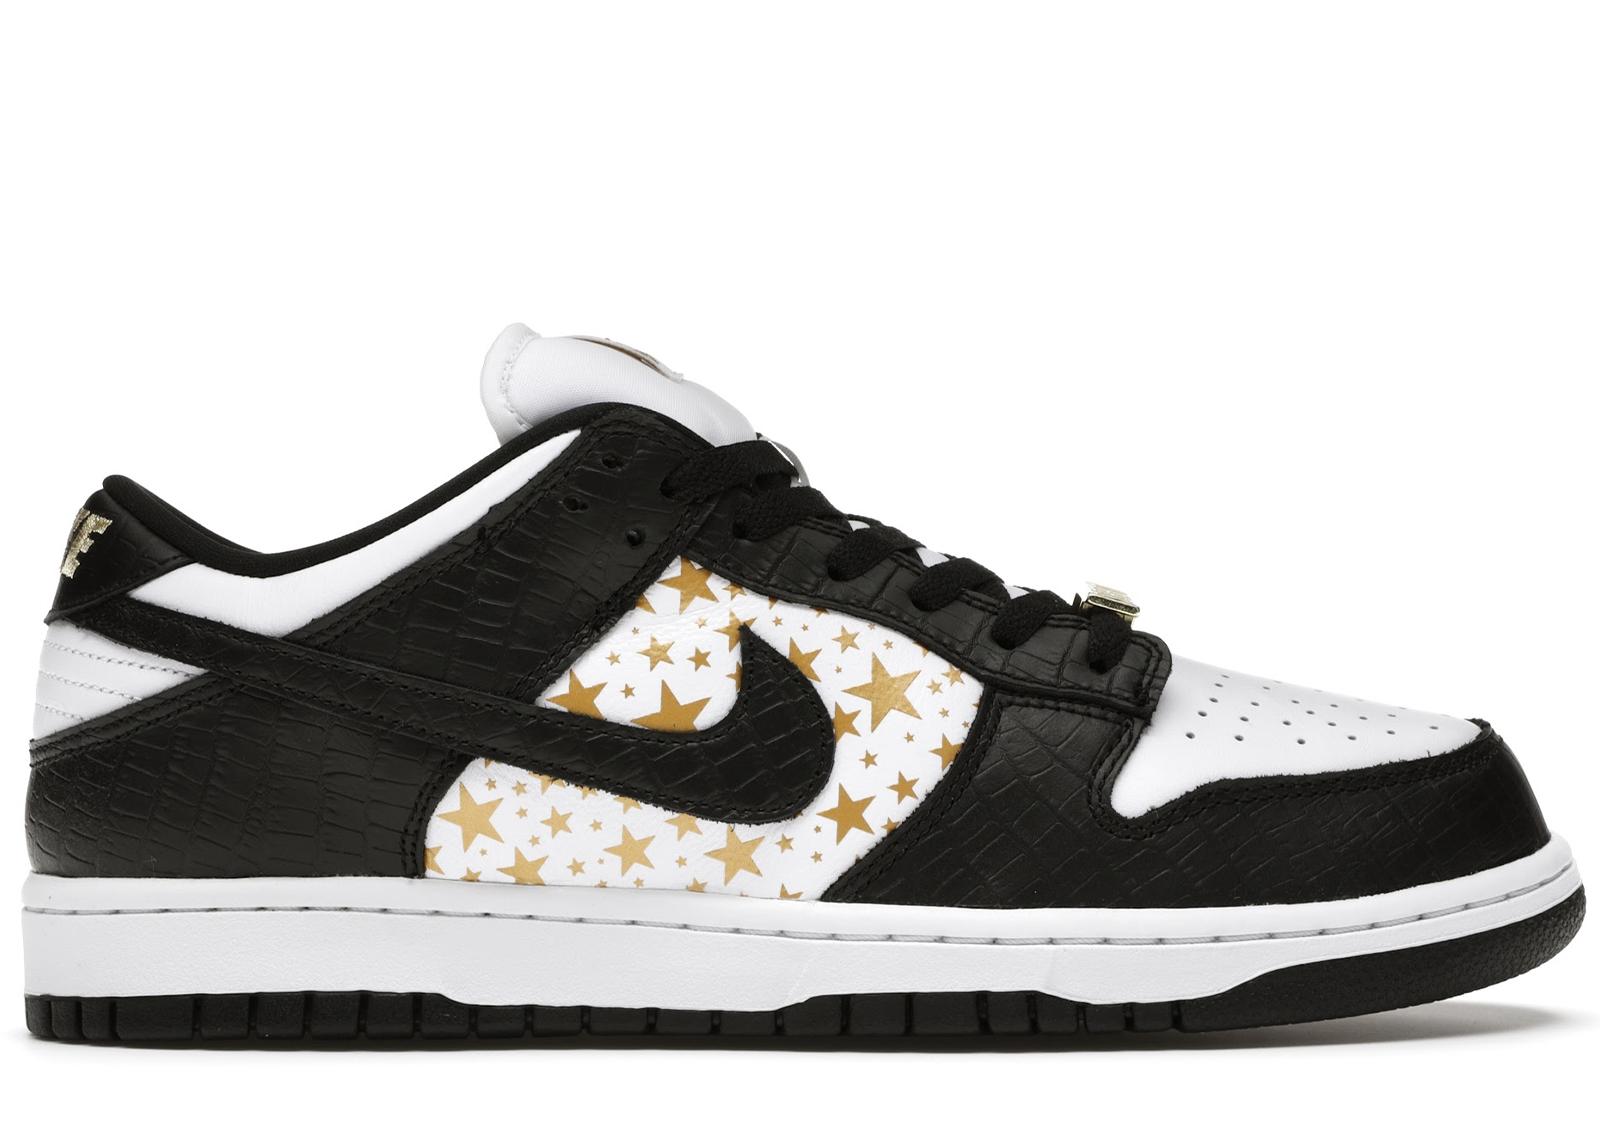 Nike SB Dunk Low Supreme Stars Black (2021) - DH3228-102